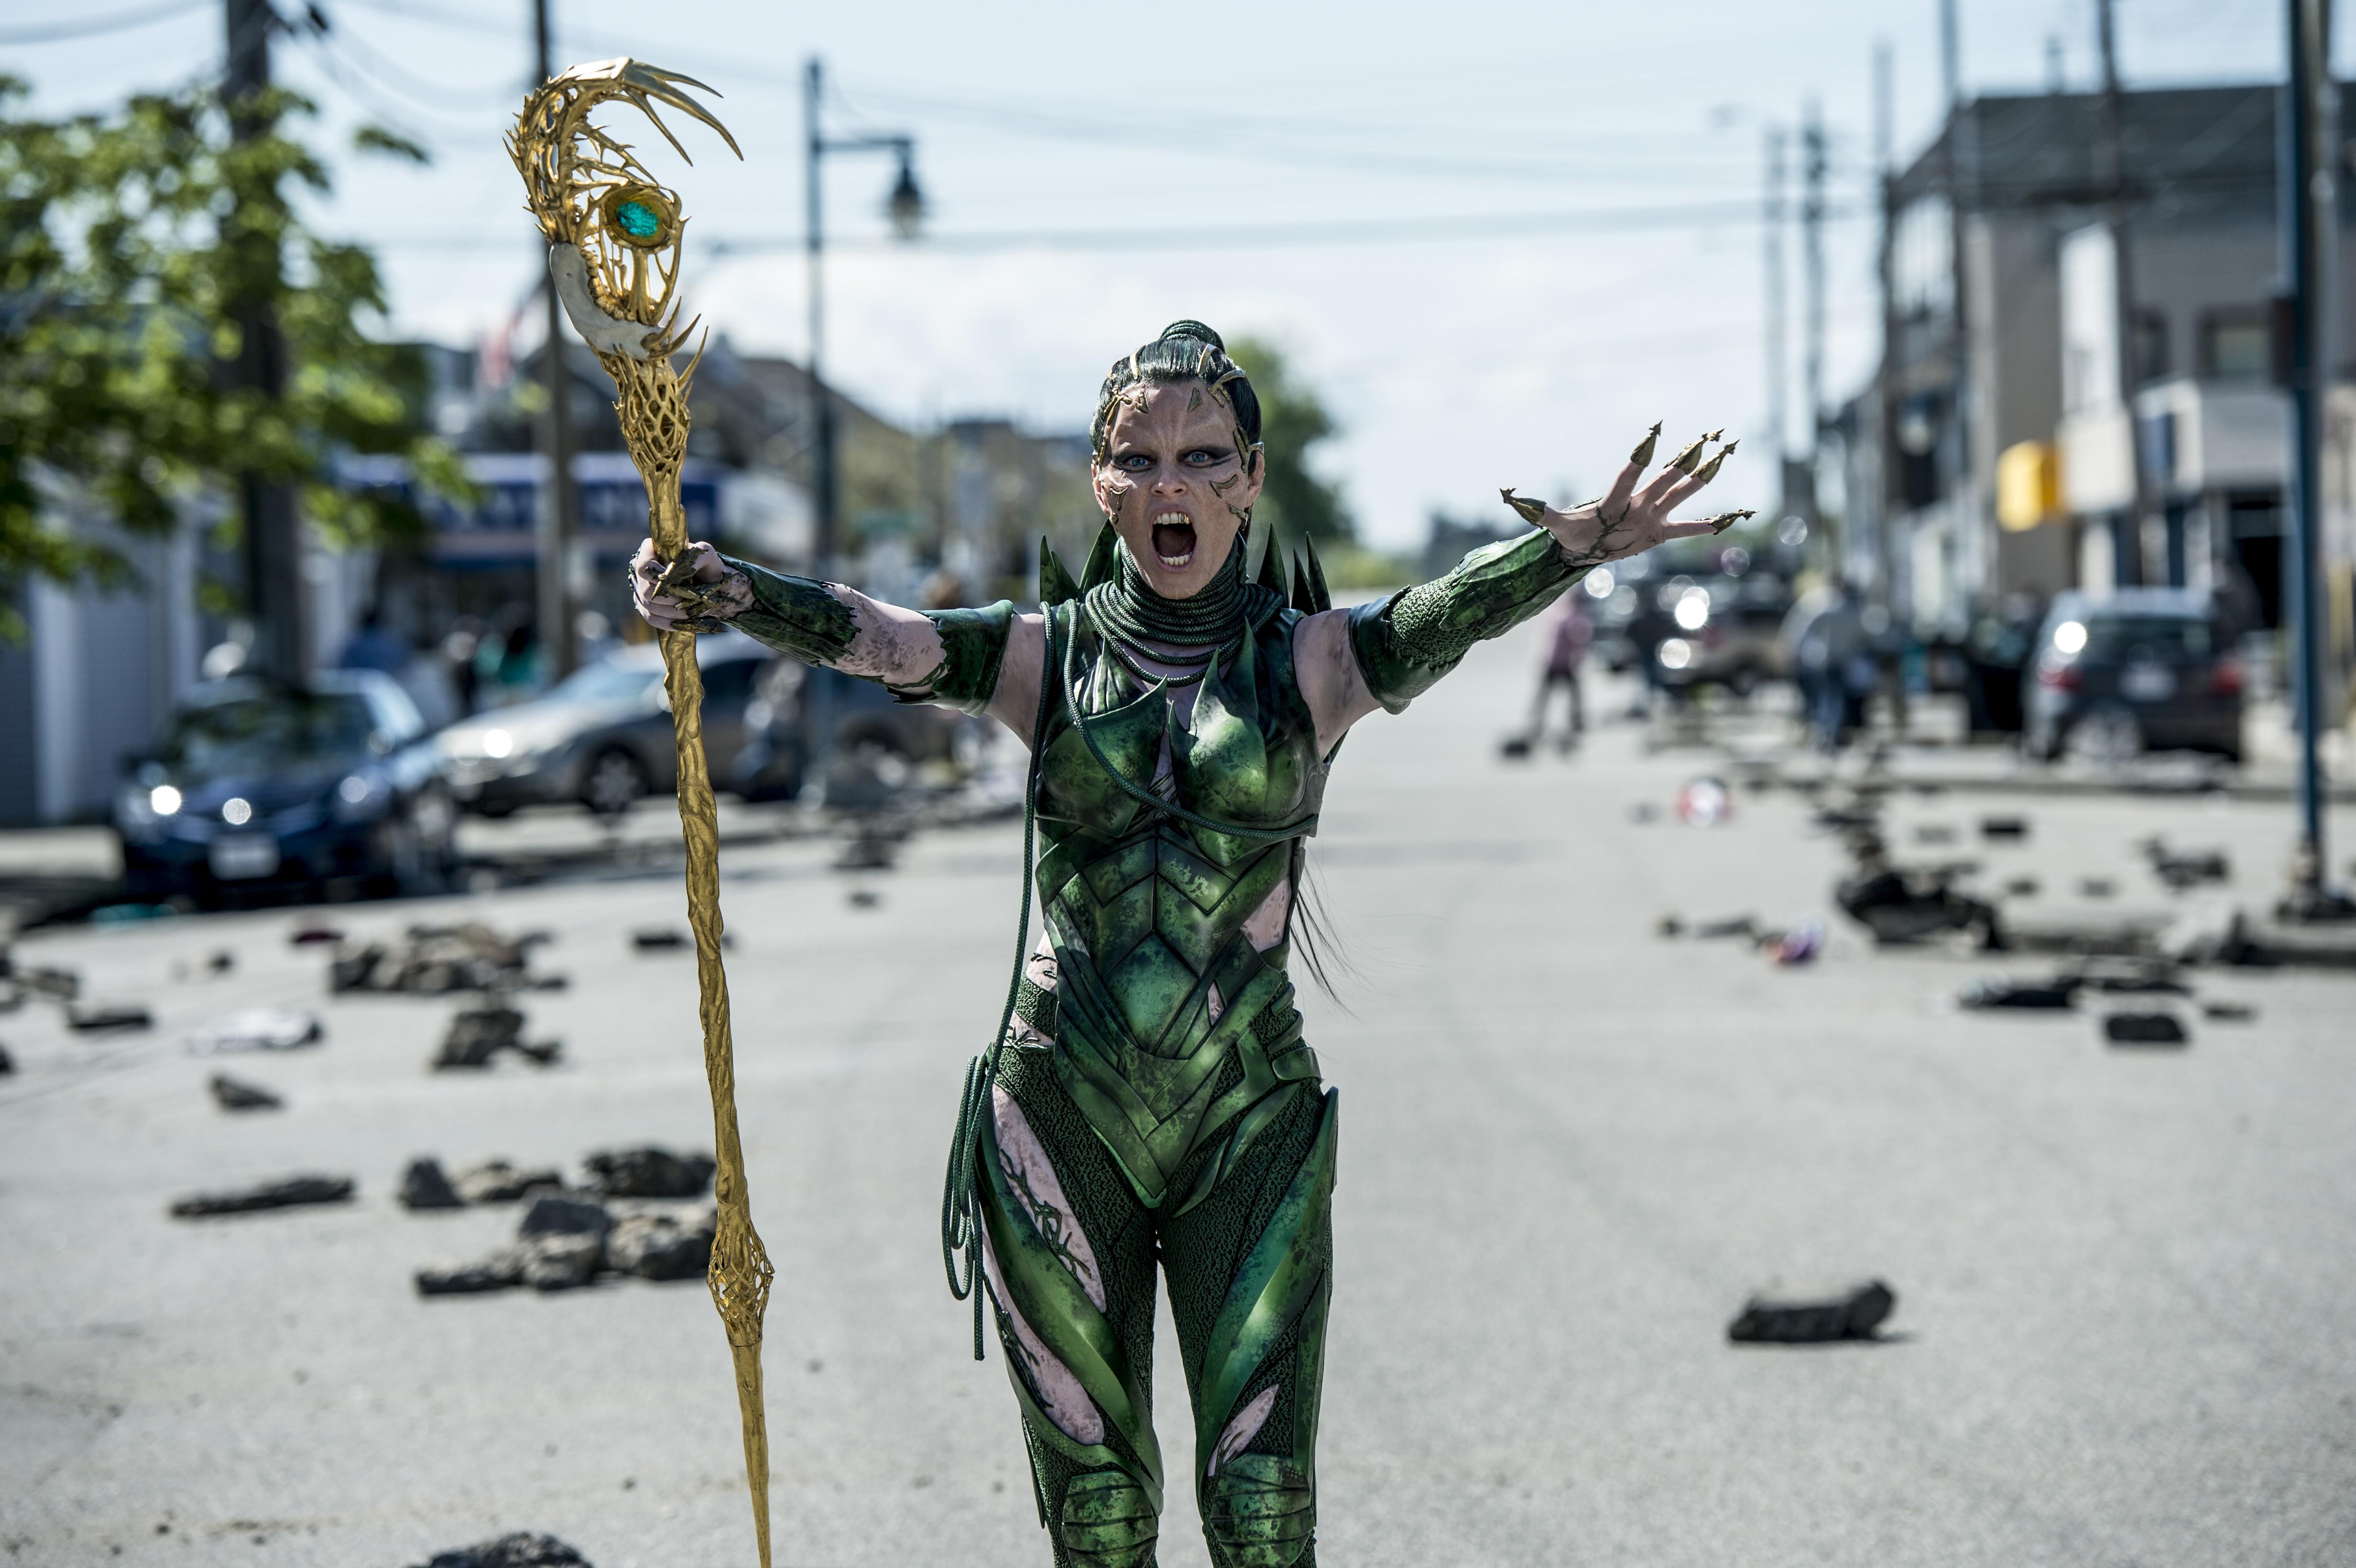 'Power Rangers' Spoilers: Elizabeth Banks Dishes On Rita Repulsa's Fate